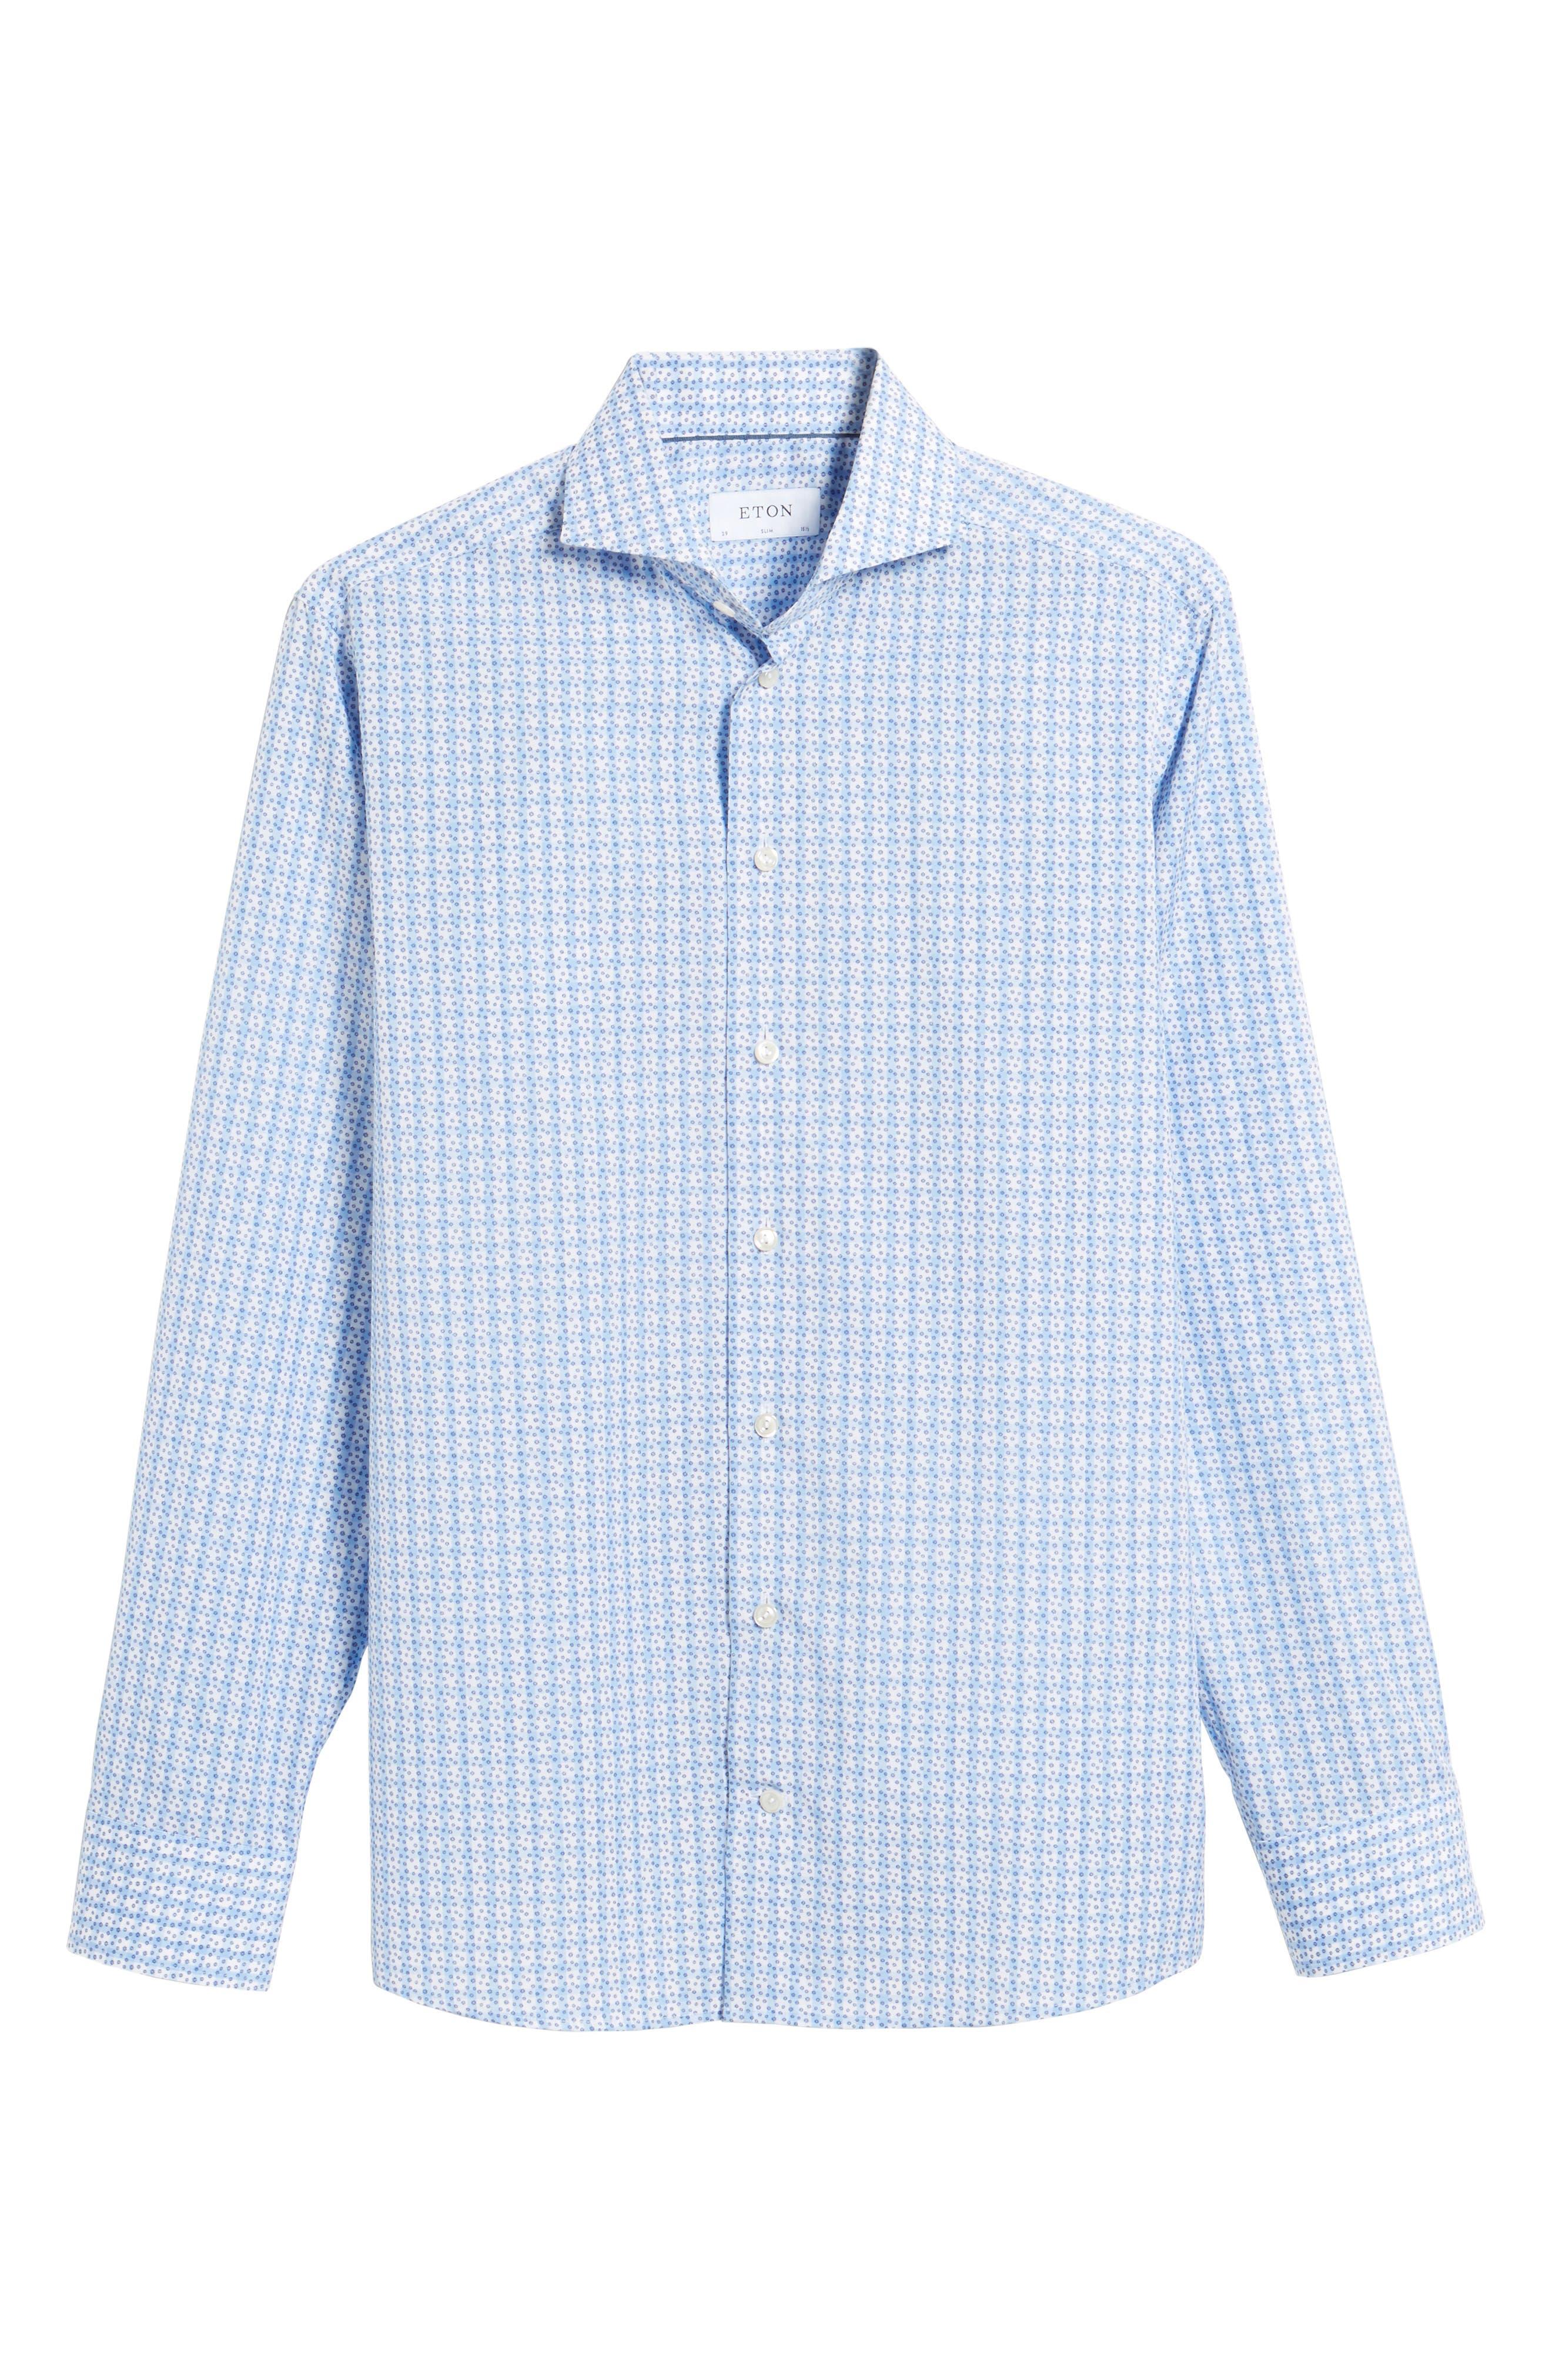 Alternate Image 7  - Eton Slim Fit Microprint Dress Shirt